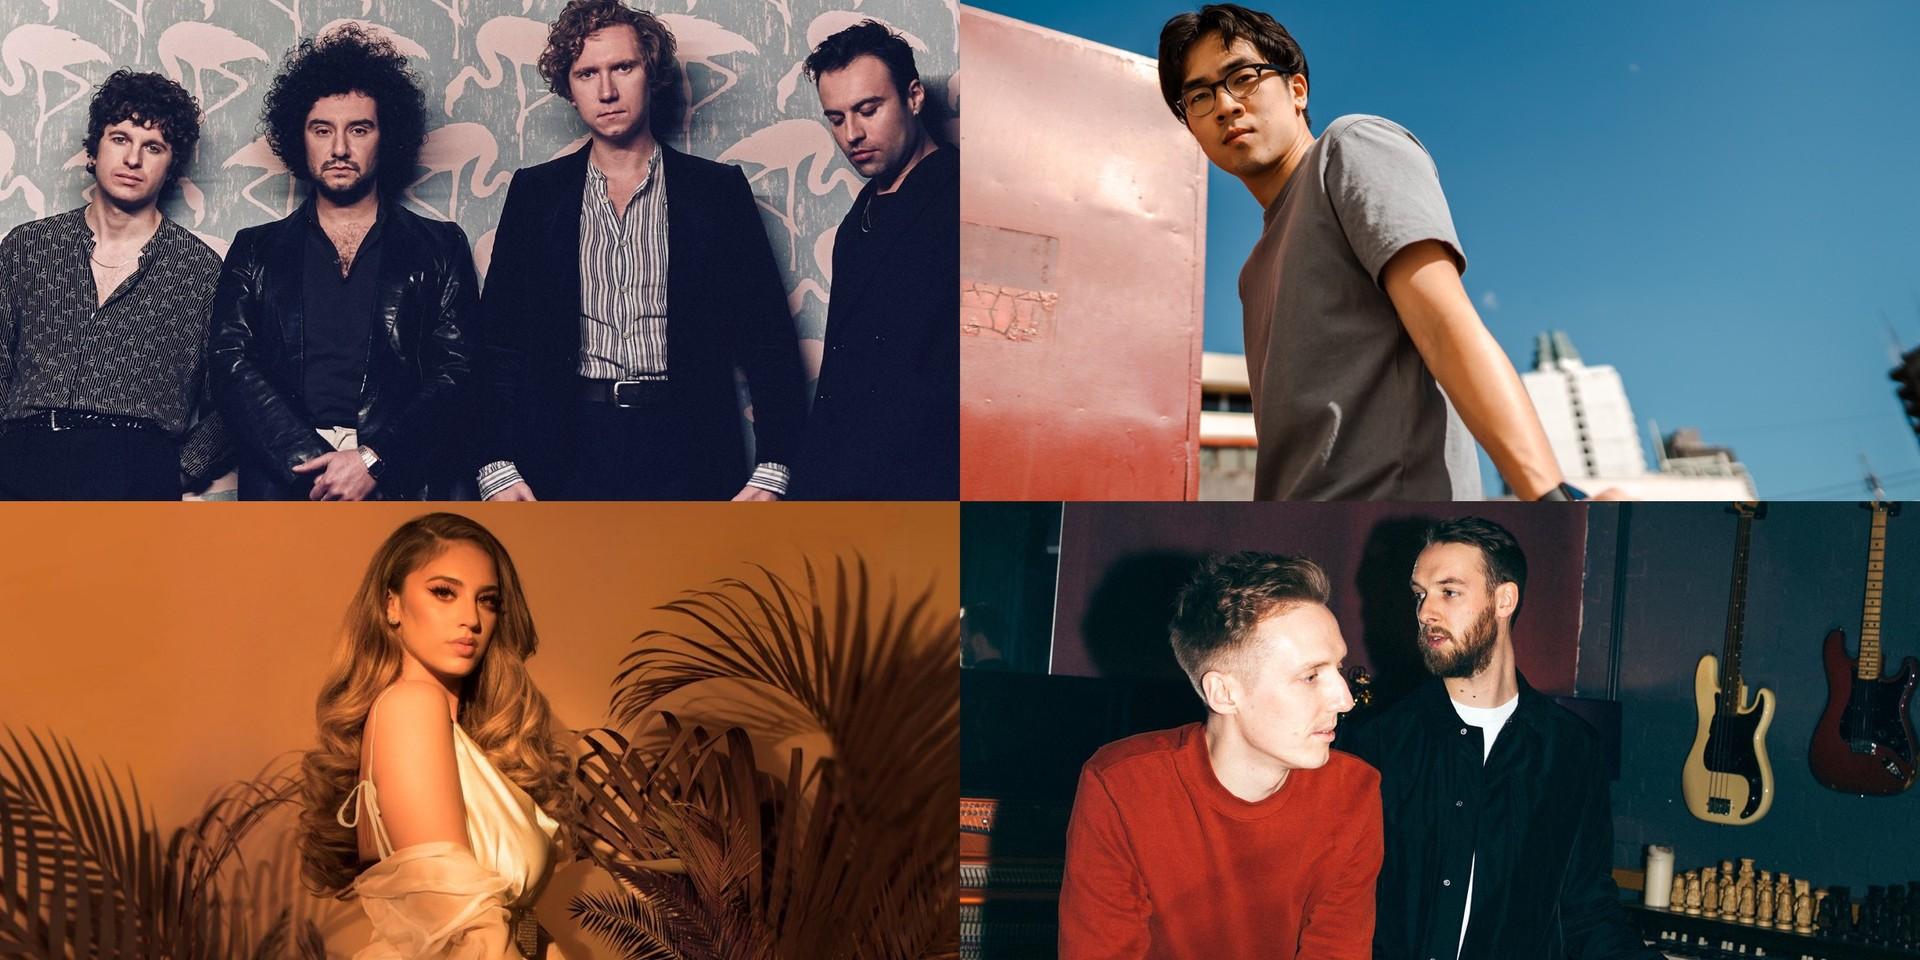 The Kooks, Honne, Alina Baraz, Charlie Lim, and more added to Wanderland 2019 lineup